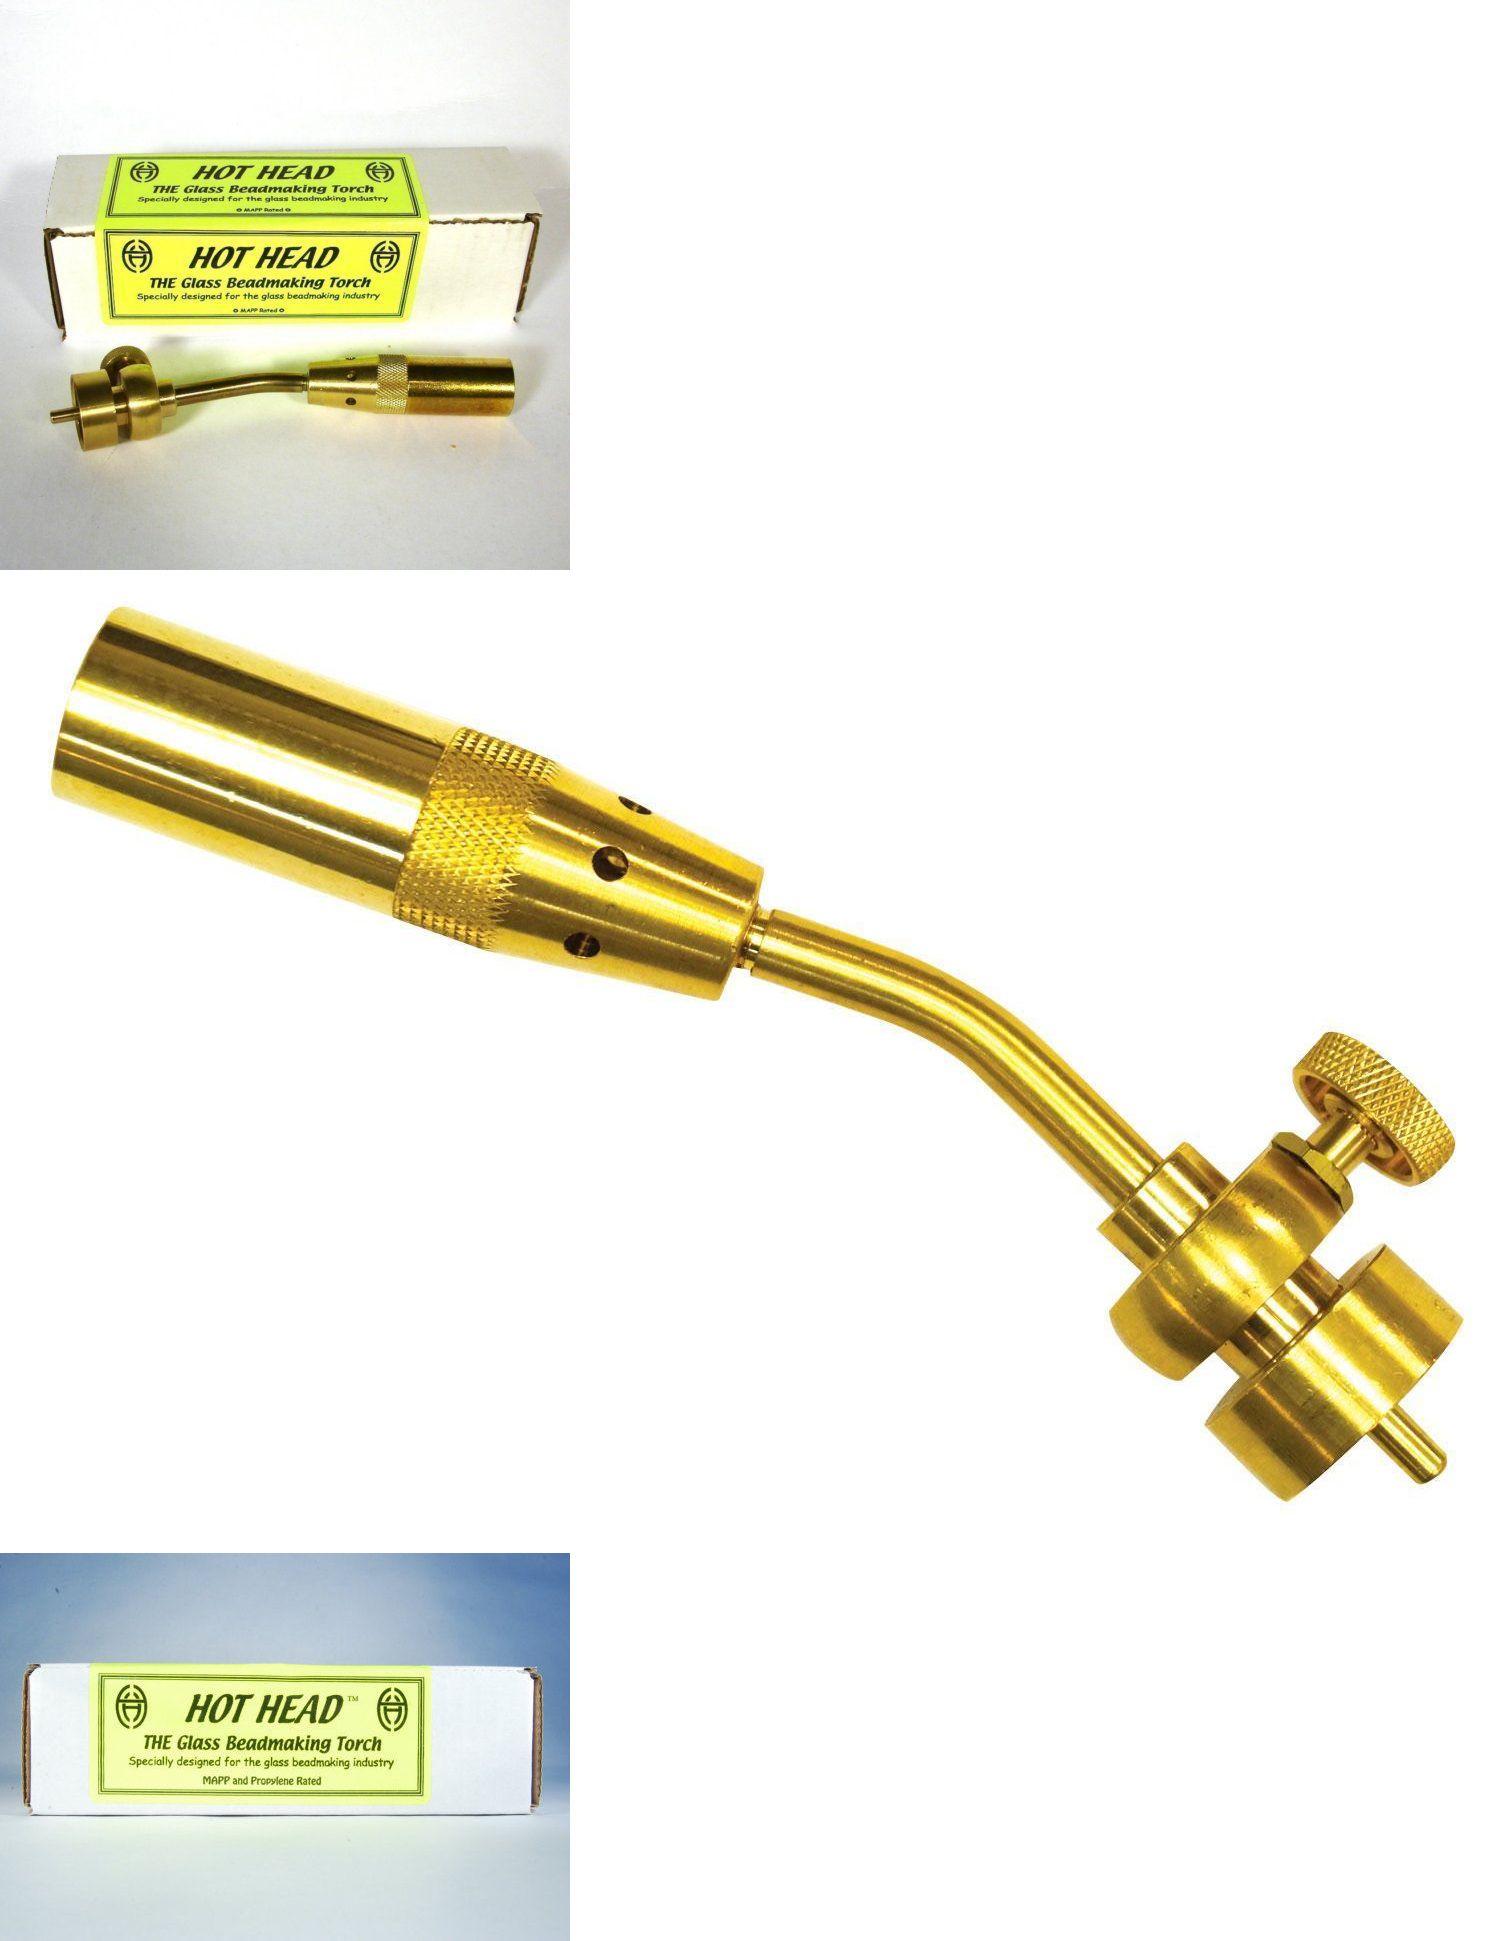 Glass Blowing 116642: Hothead Glass Beadmaking Torch, Mapp